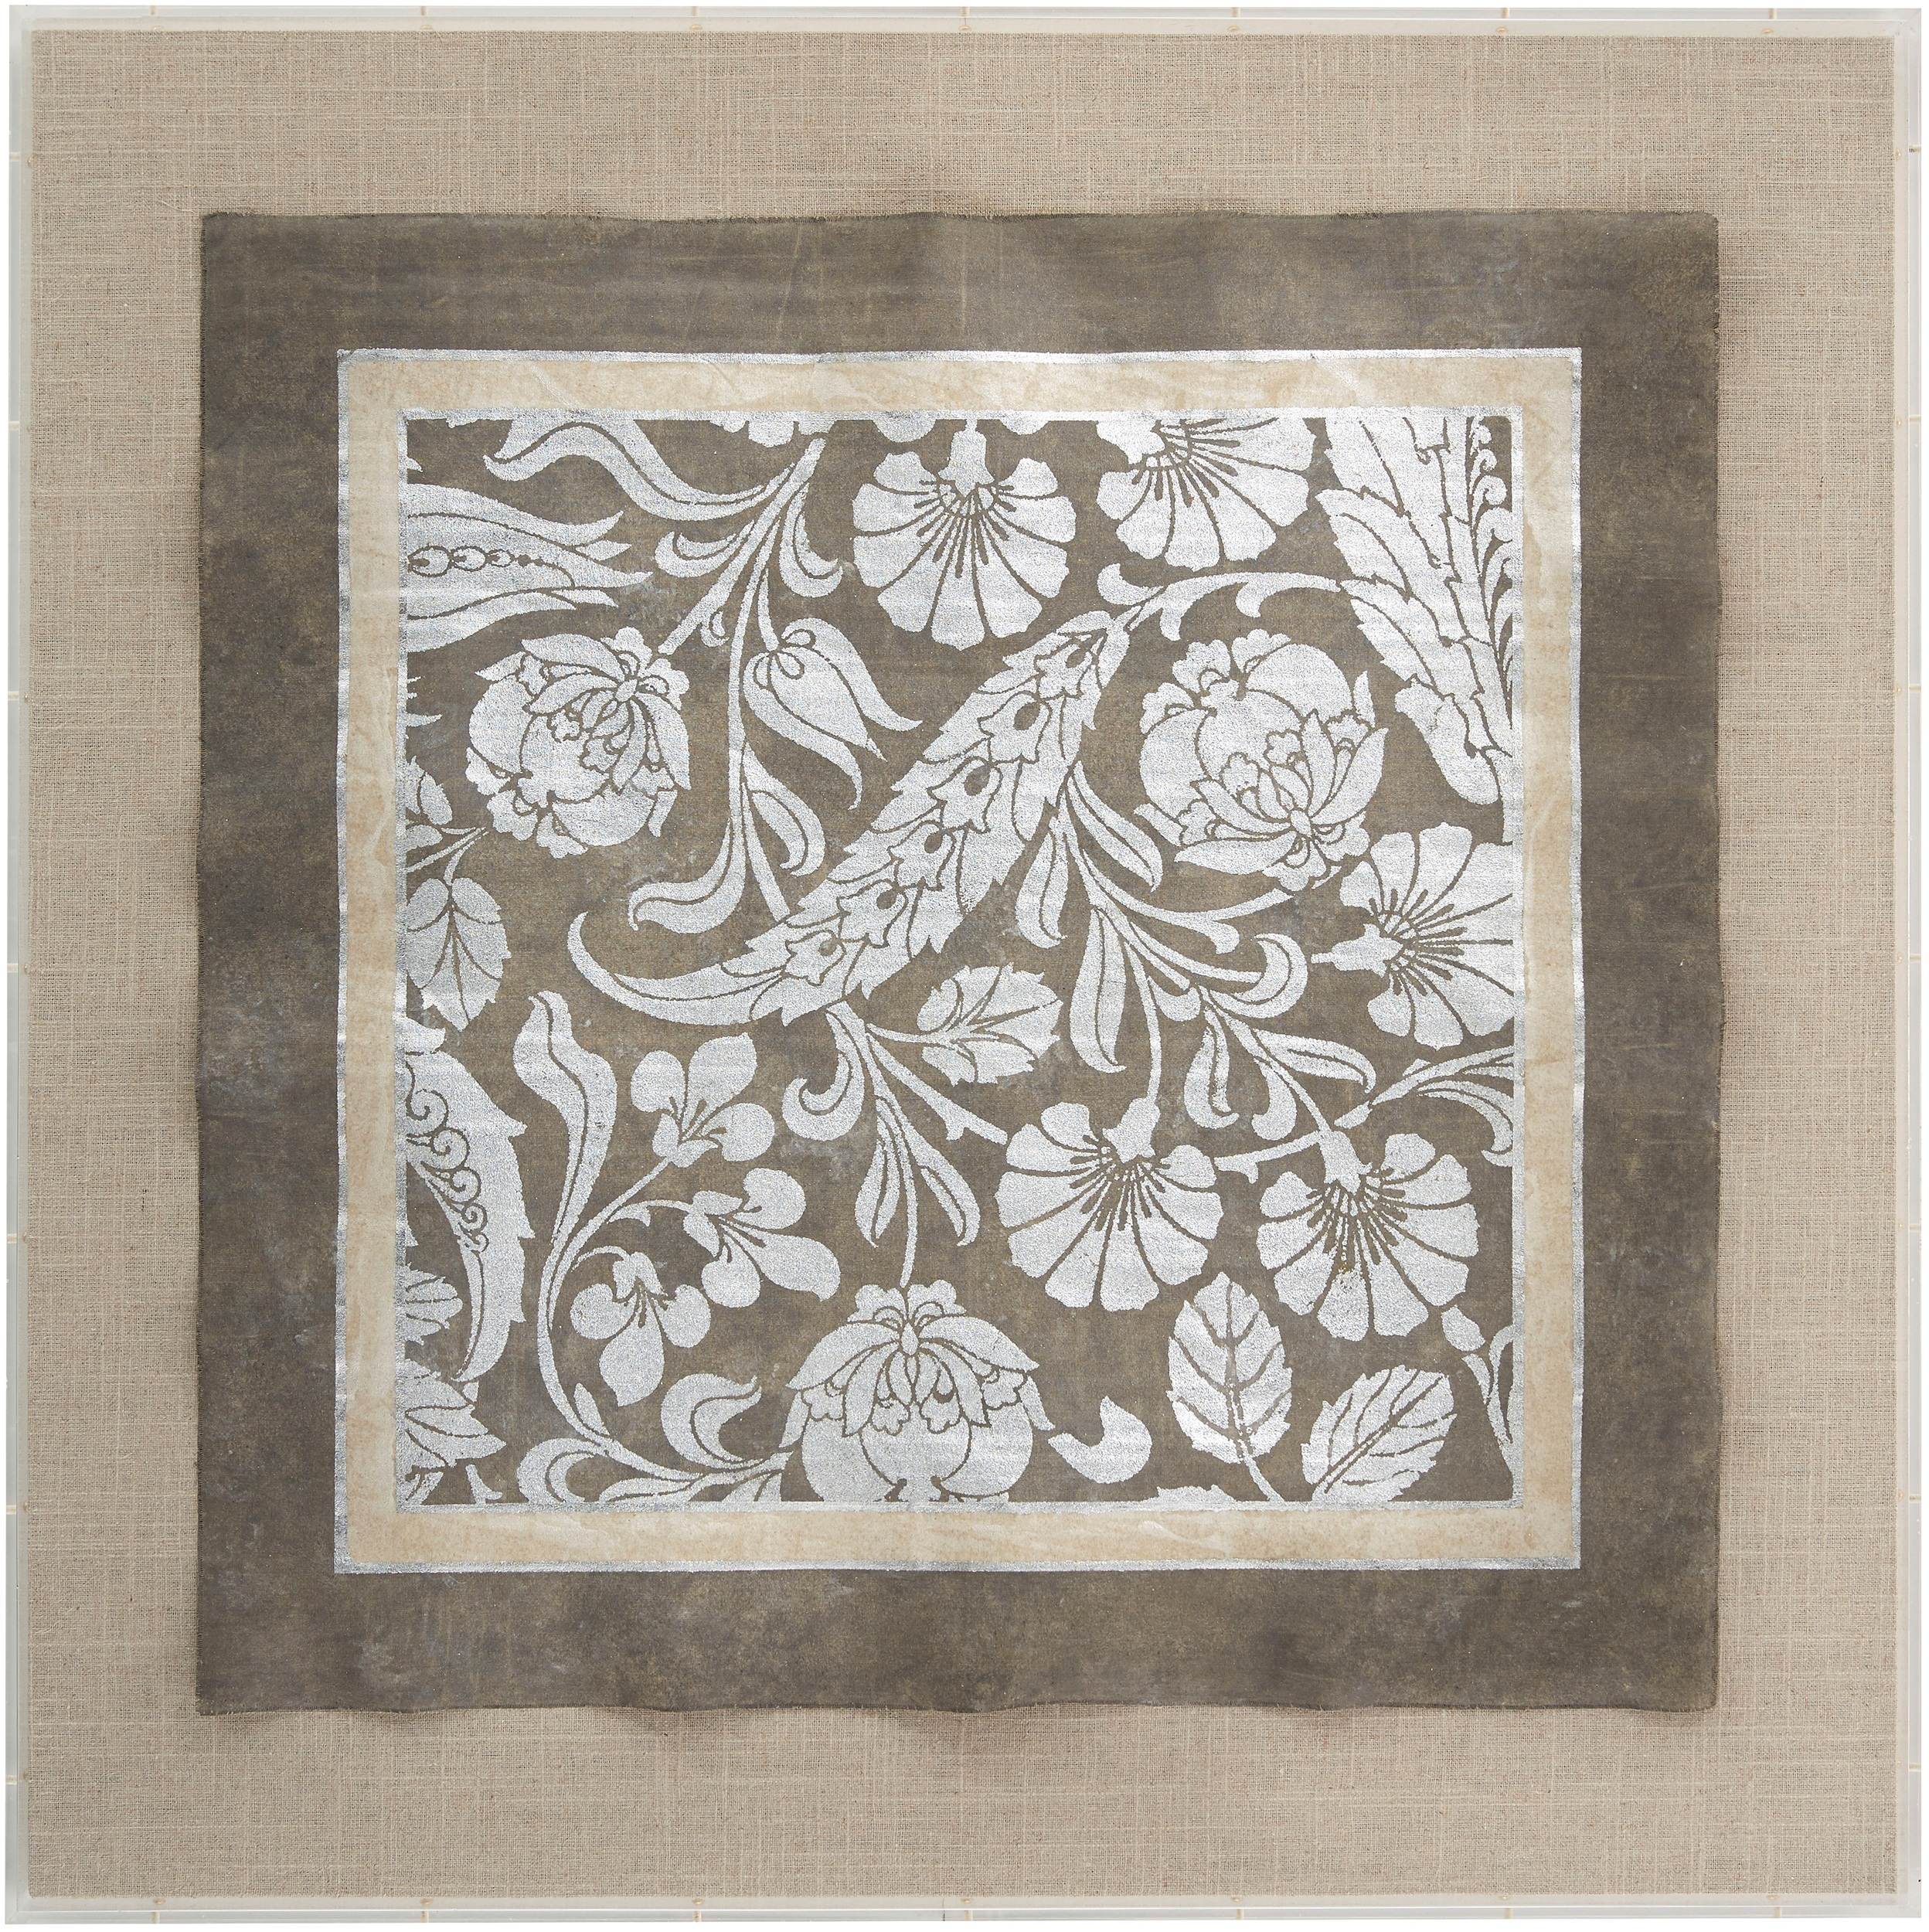 28 x 28 Tapestry